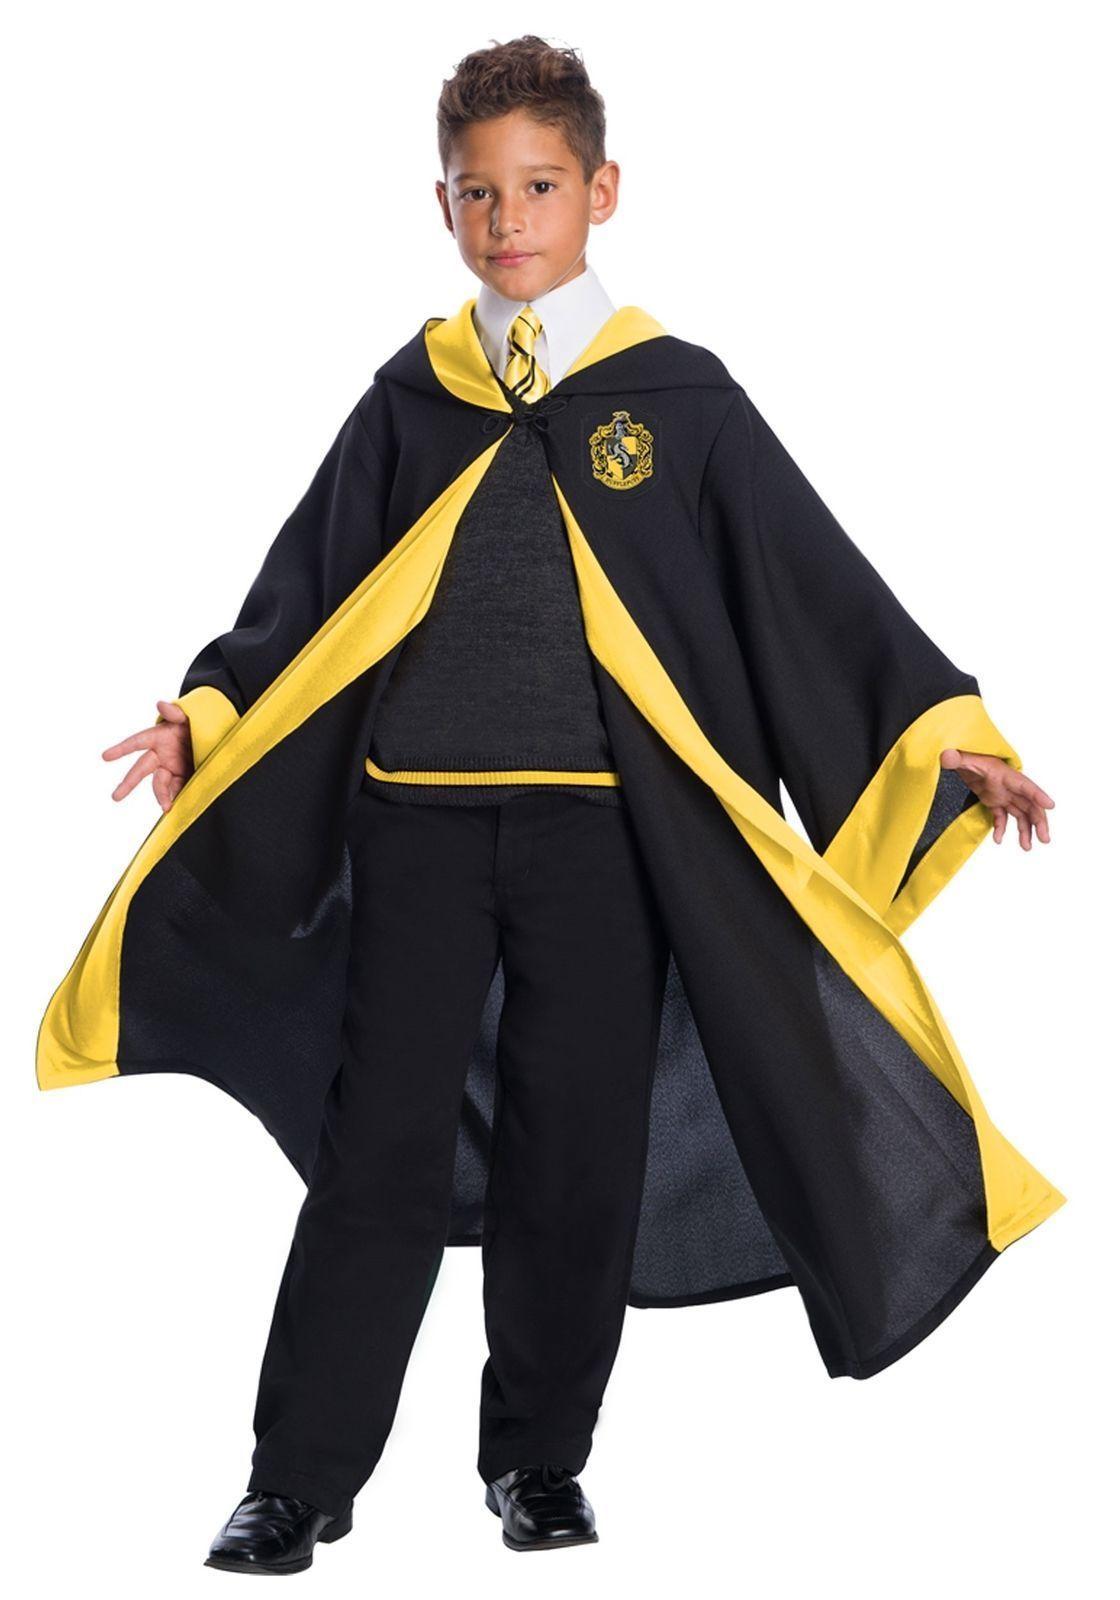 Charades Harry Potter Hufflepuff Student Childrens Kids Halloween Costume 03584C